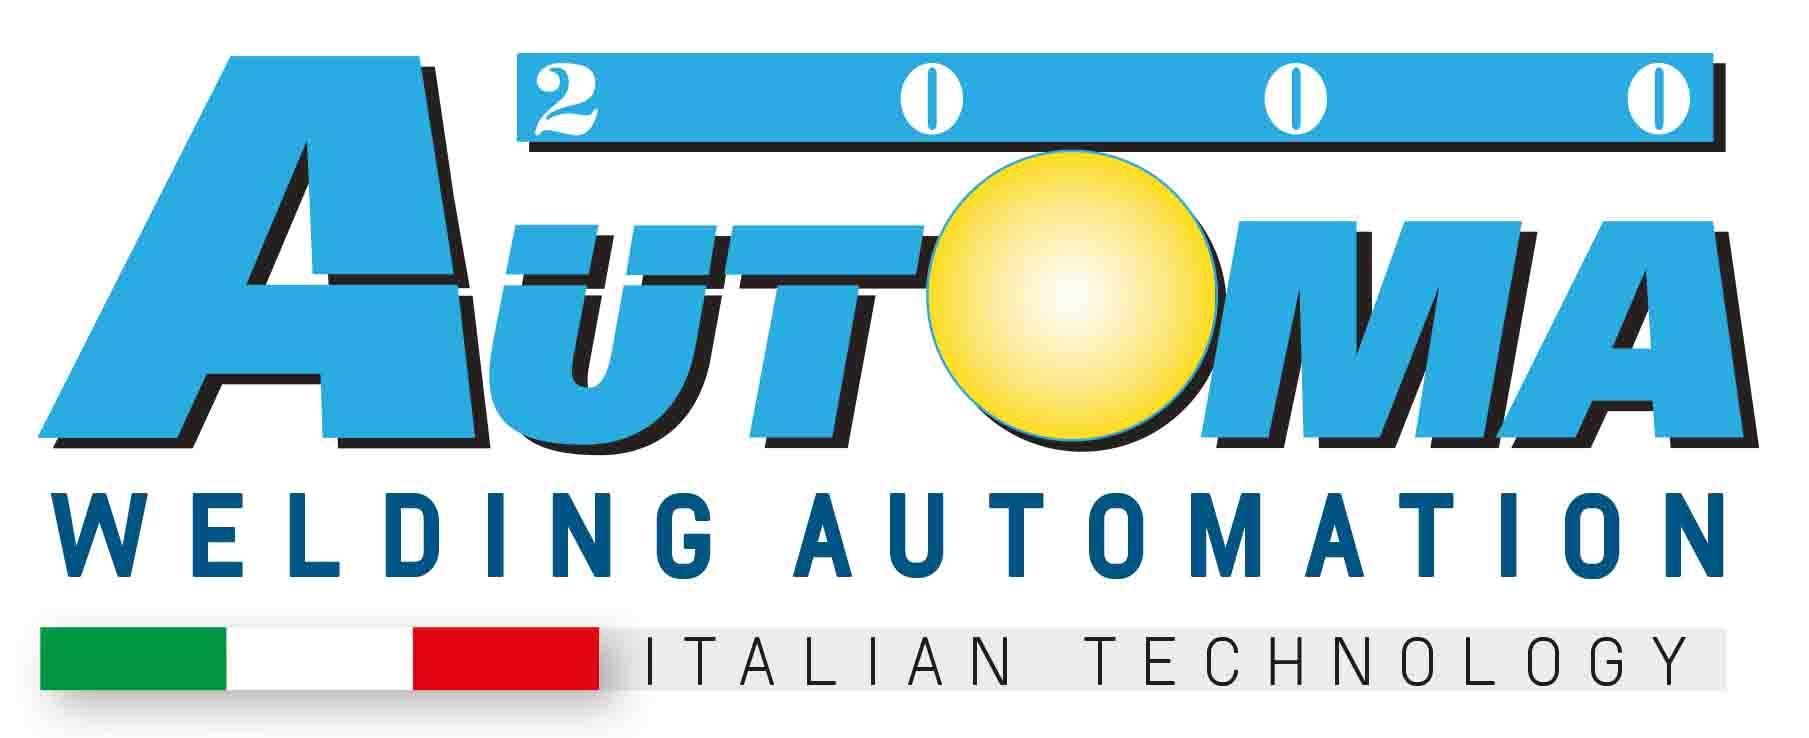 Logo Automa2000